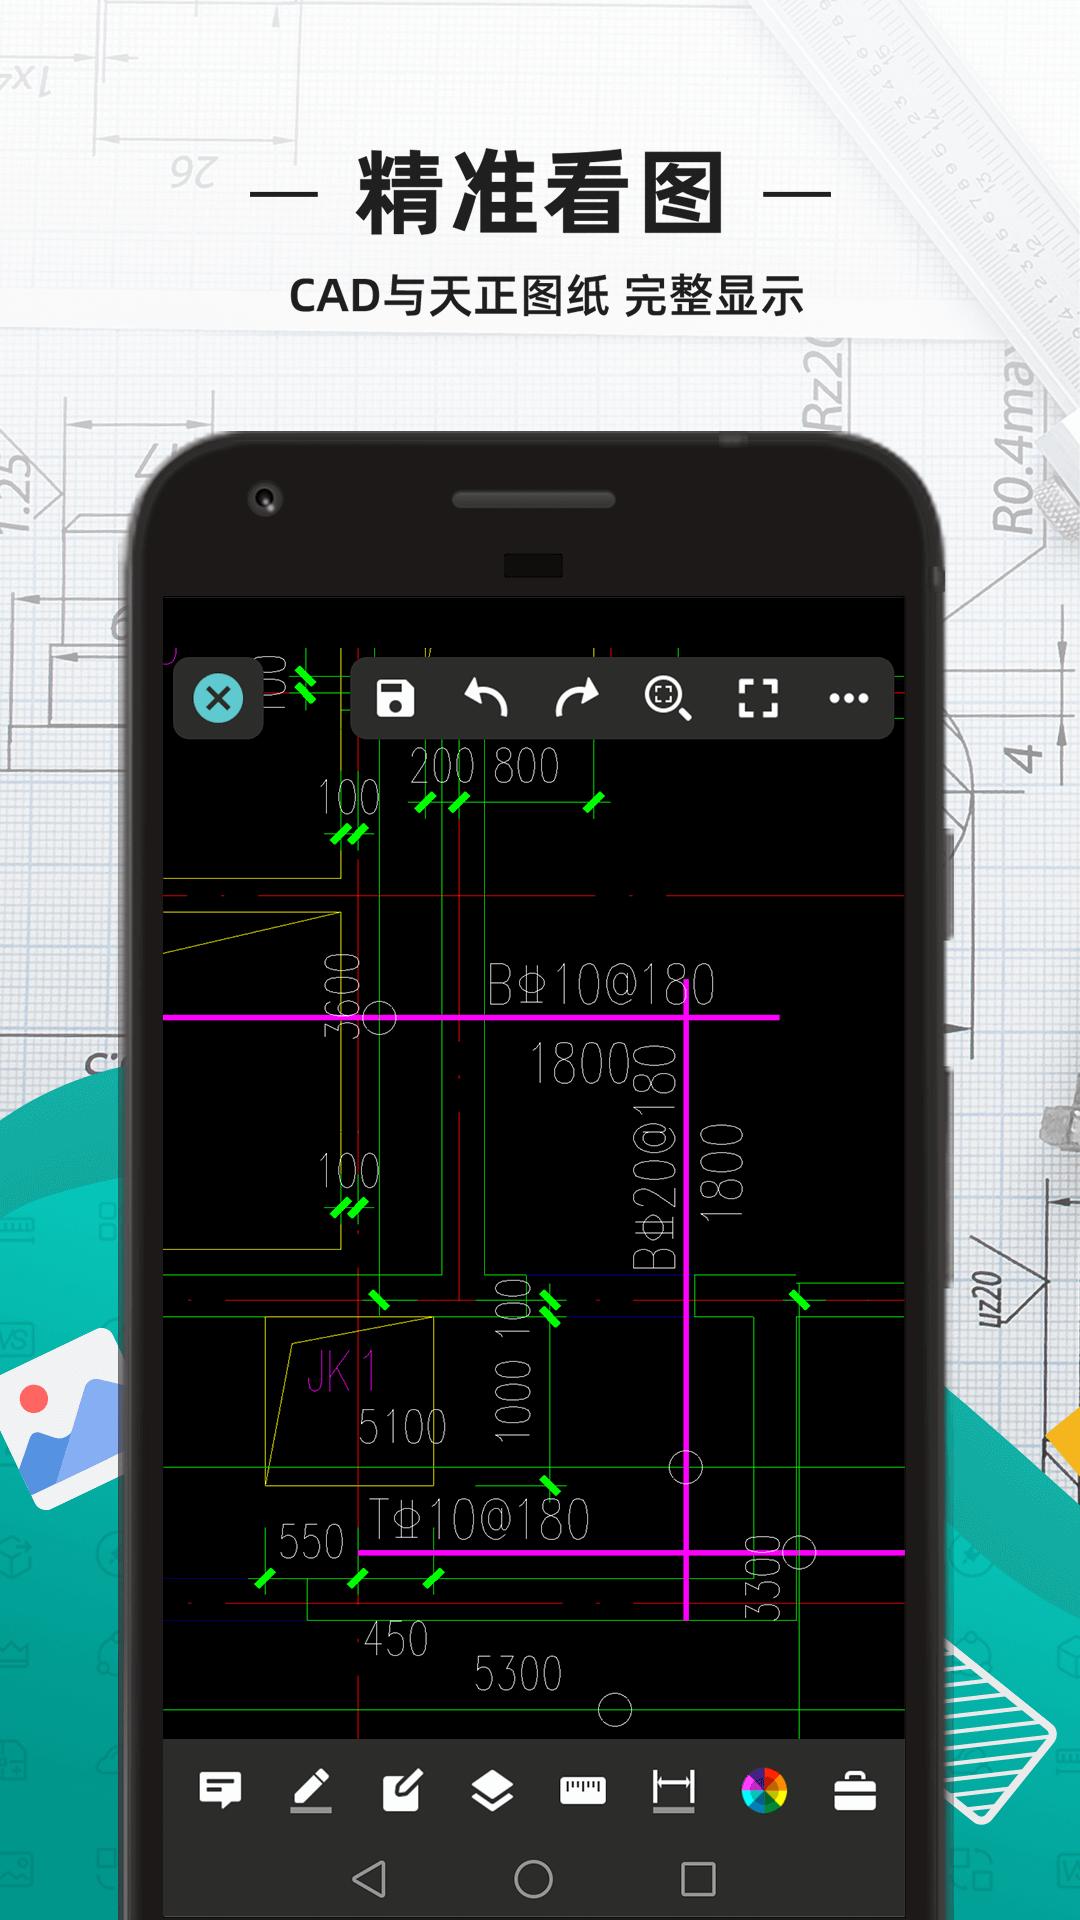 CAD看图王截图(2)